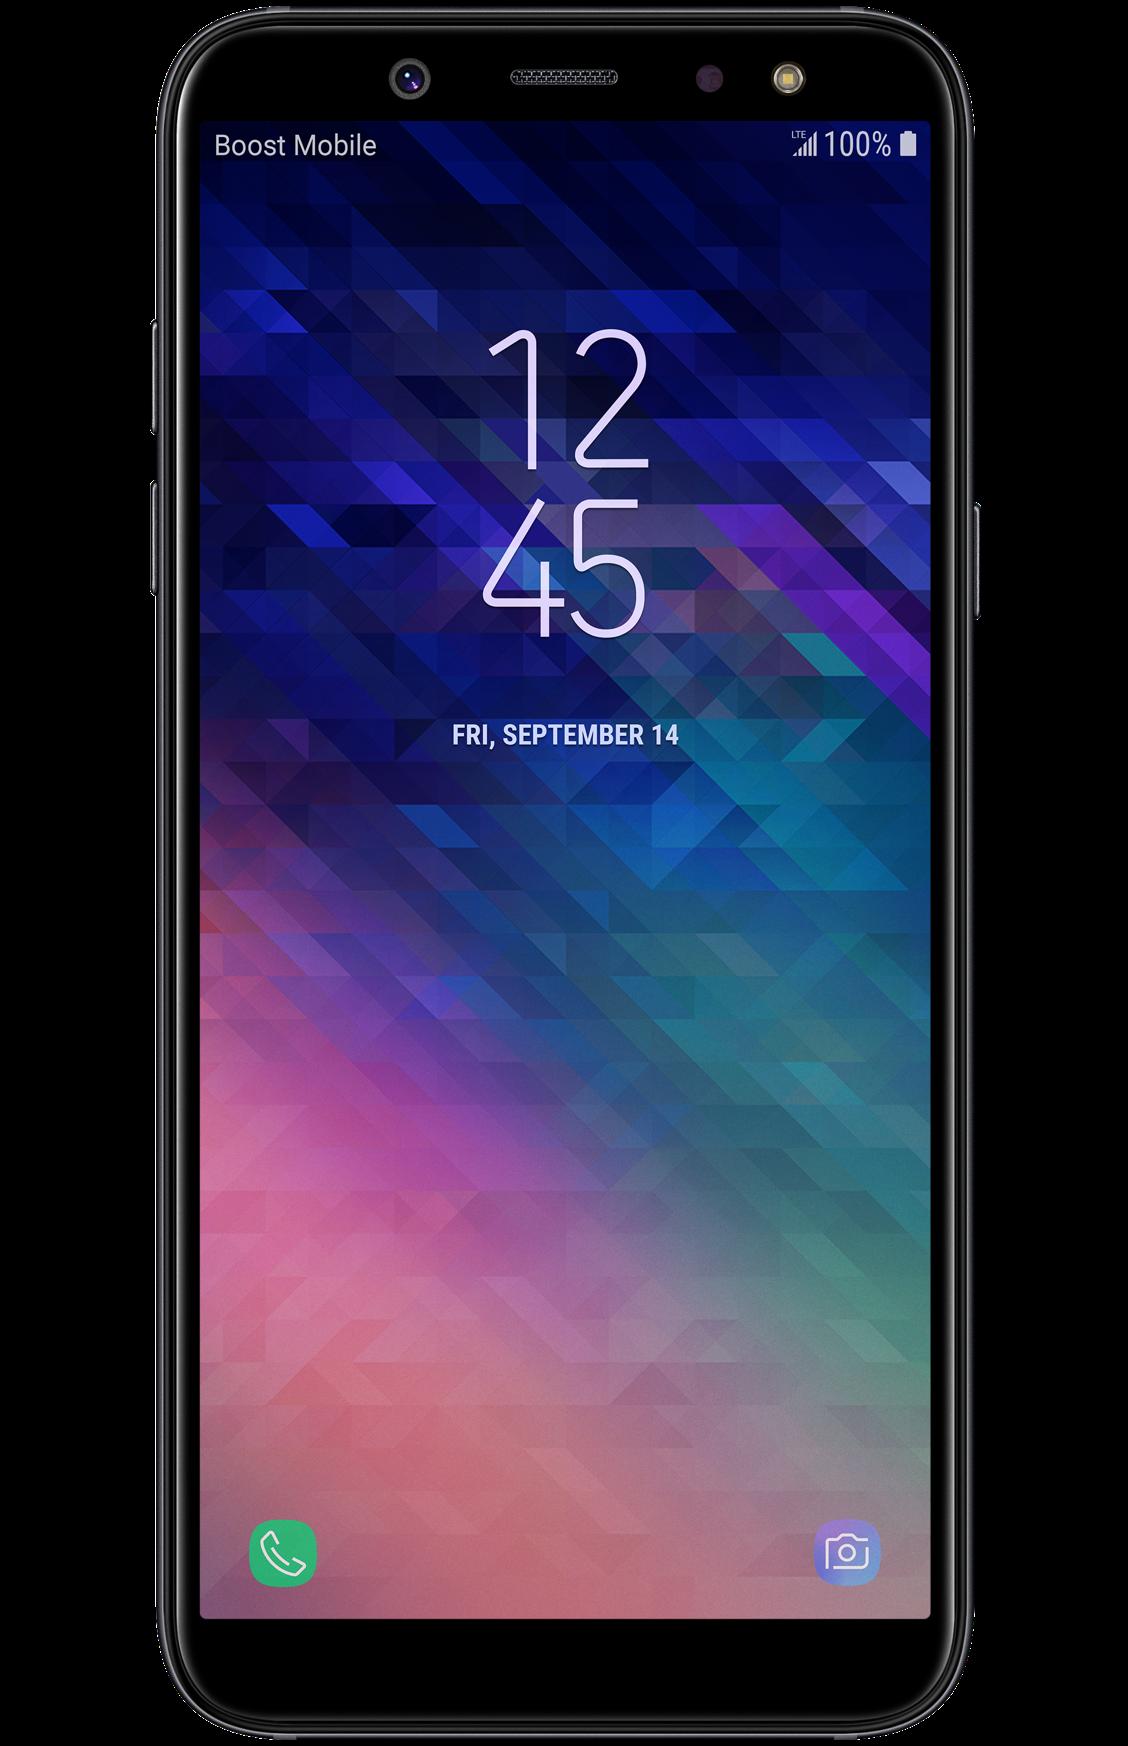 Samsung Galaxy A6 32gb Black Boost Mobile Boost Mobile Prepaid Phones Samsung